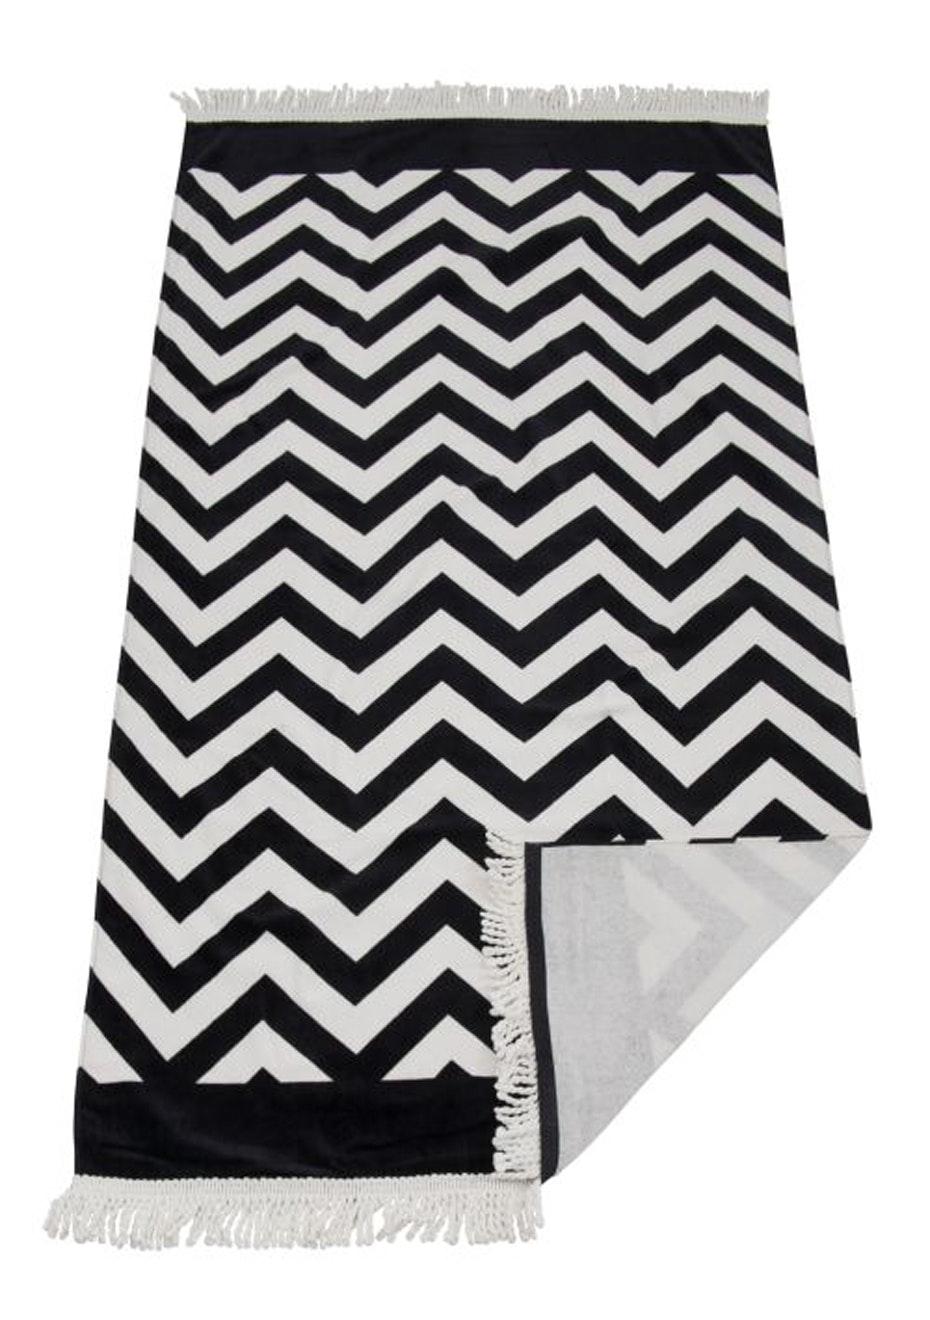 Zig Zag Beach Towel Black With Fringe